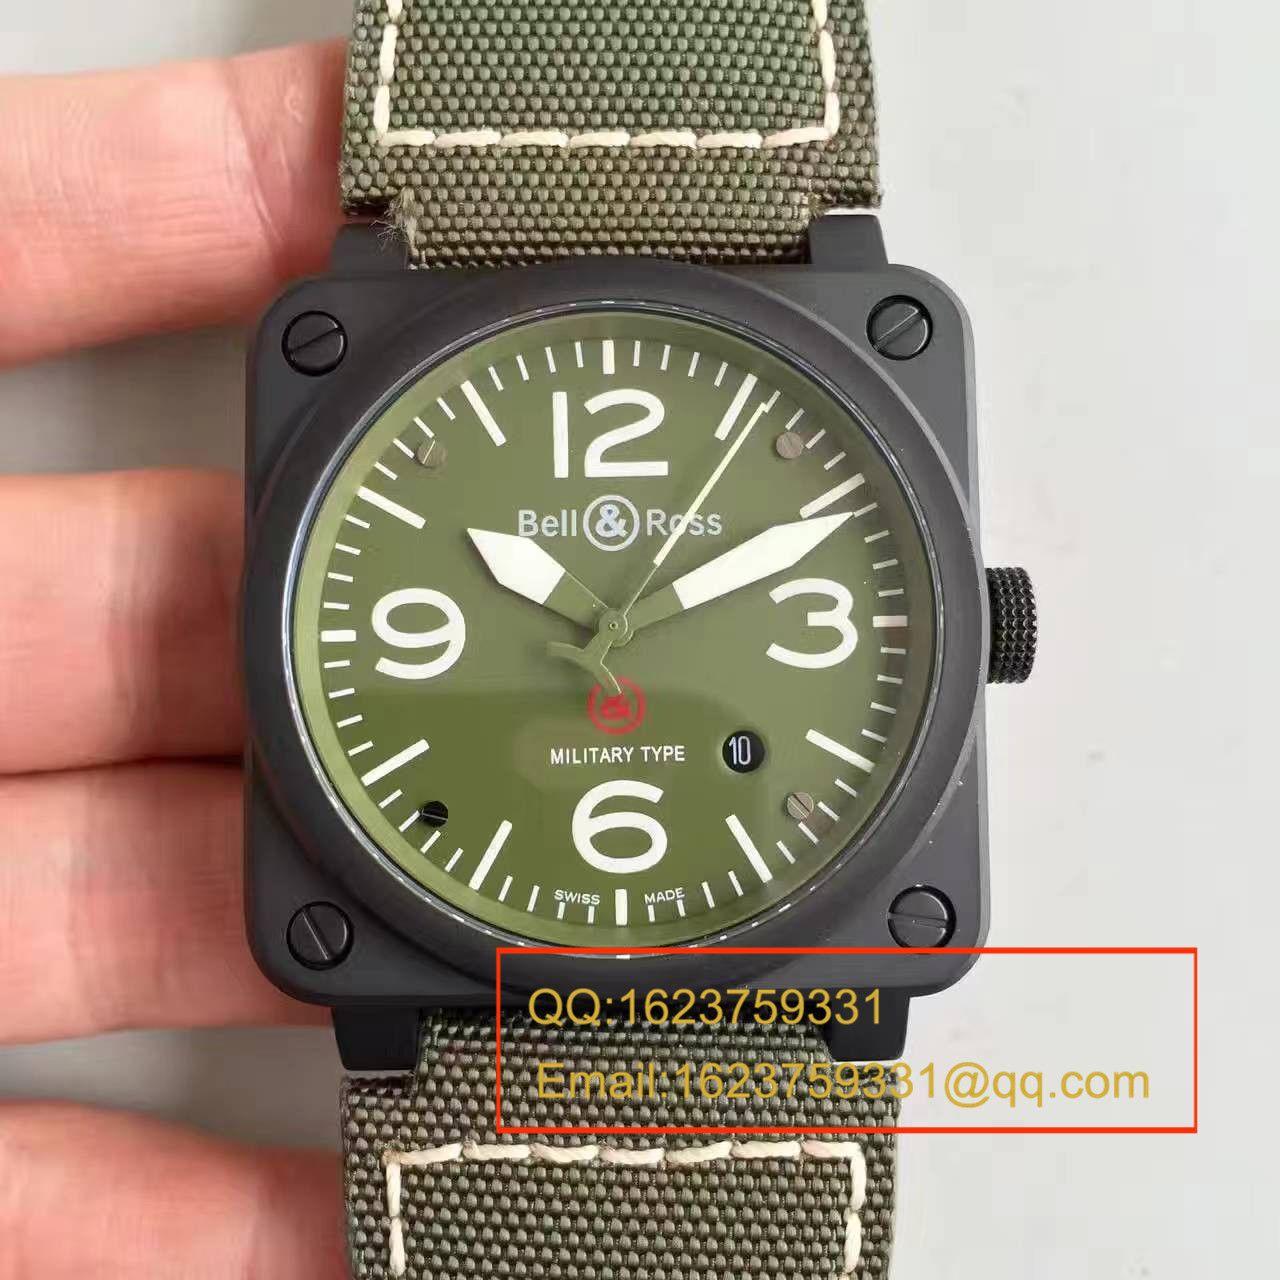 【BR厂顶级复刻高仿手表】柏莱士AVIATION系列BR 03-92 Military Carbon腕表